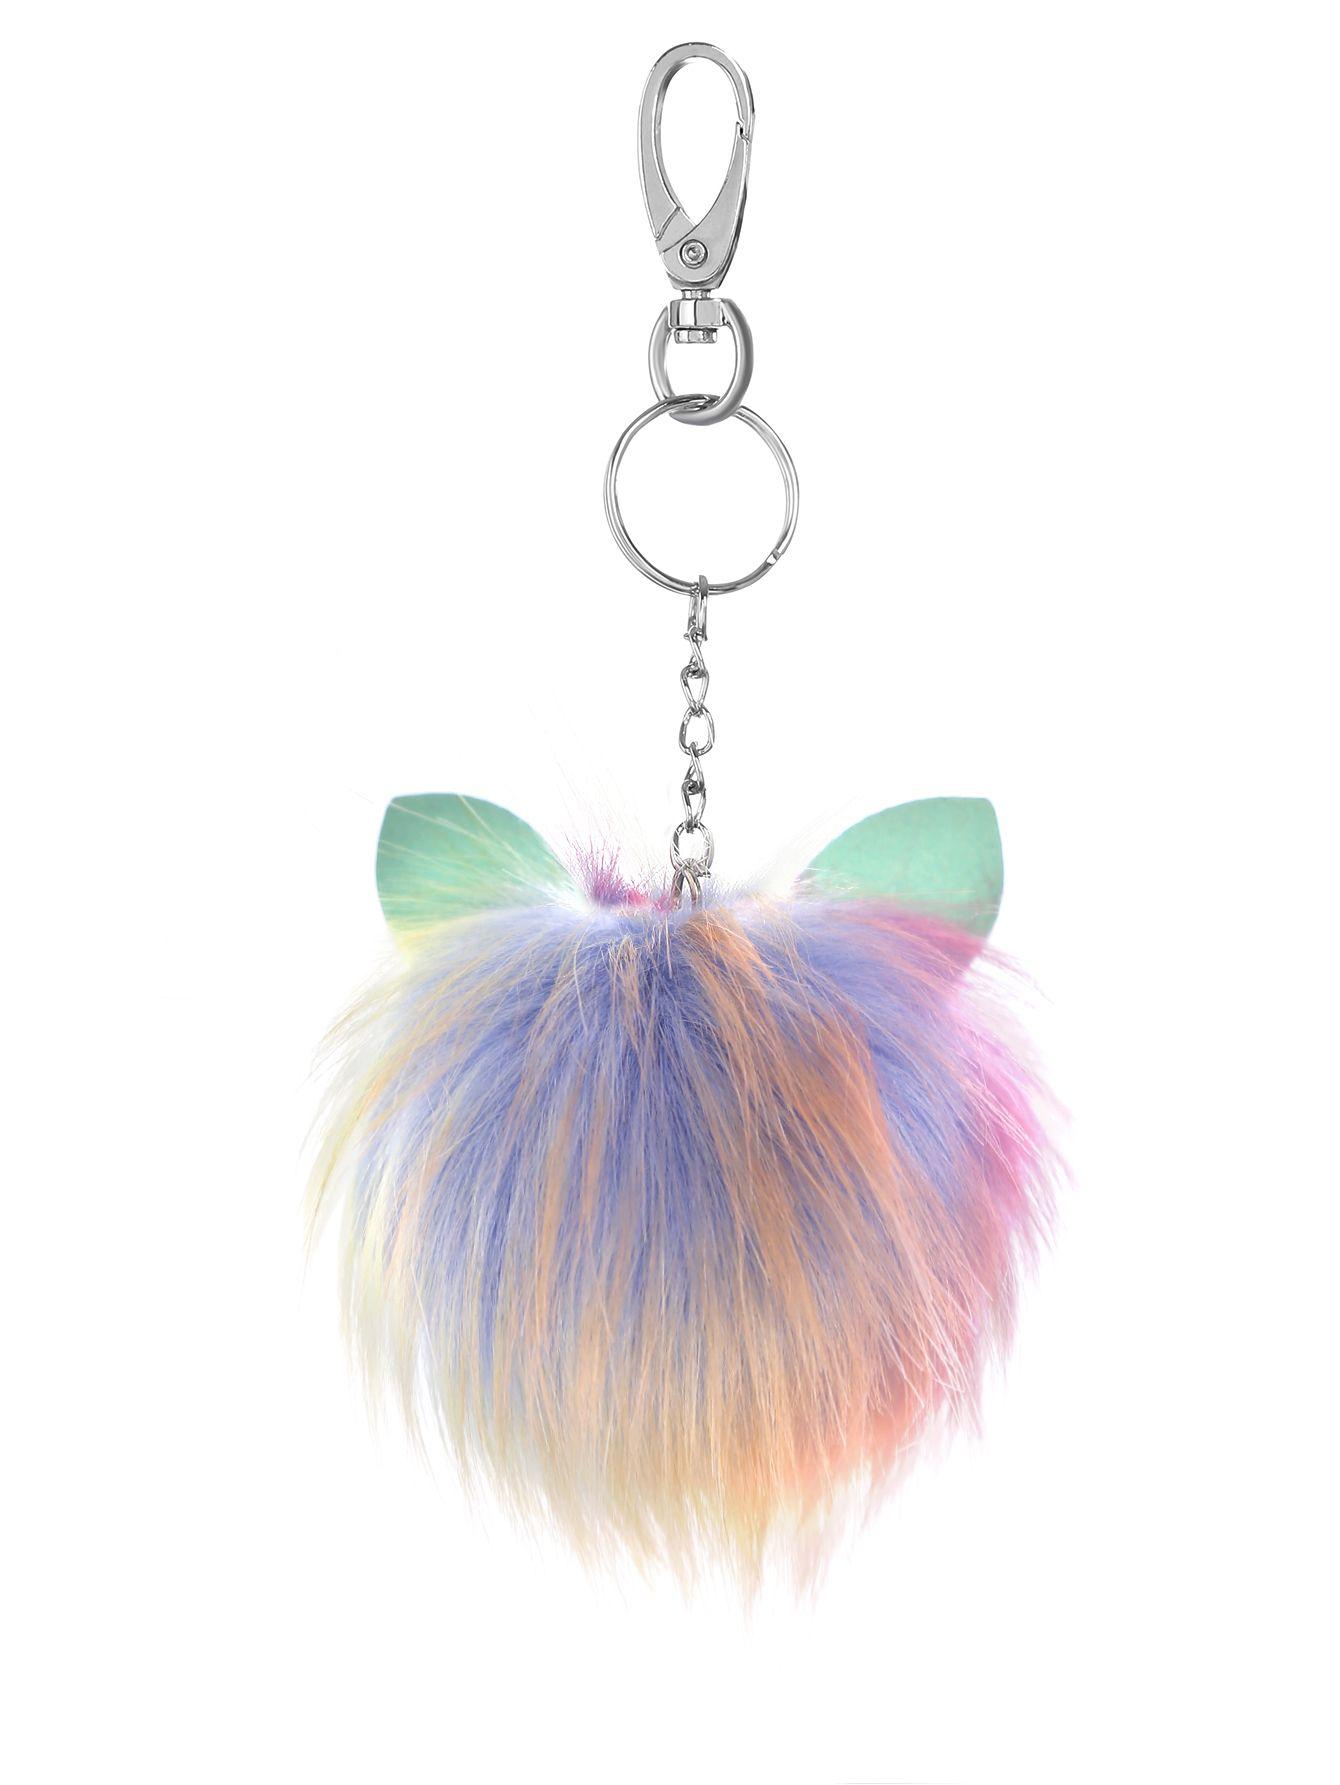 37d9330d92 Shop Colorful Pom Pom Keychain online. SheIn offers Colorful Pom Pom  Keychain & more to fit your fashionable needs.